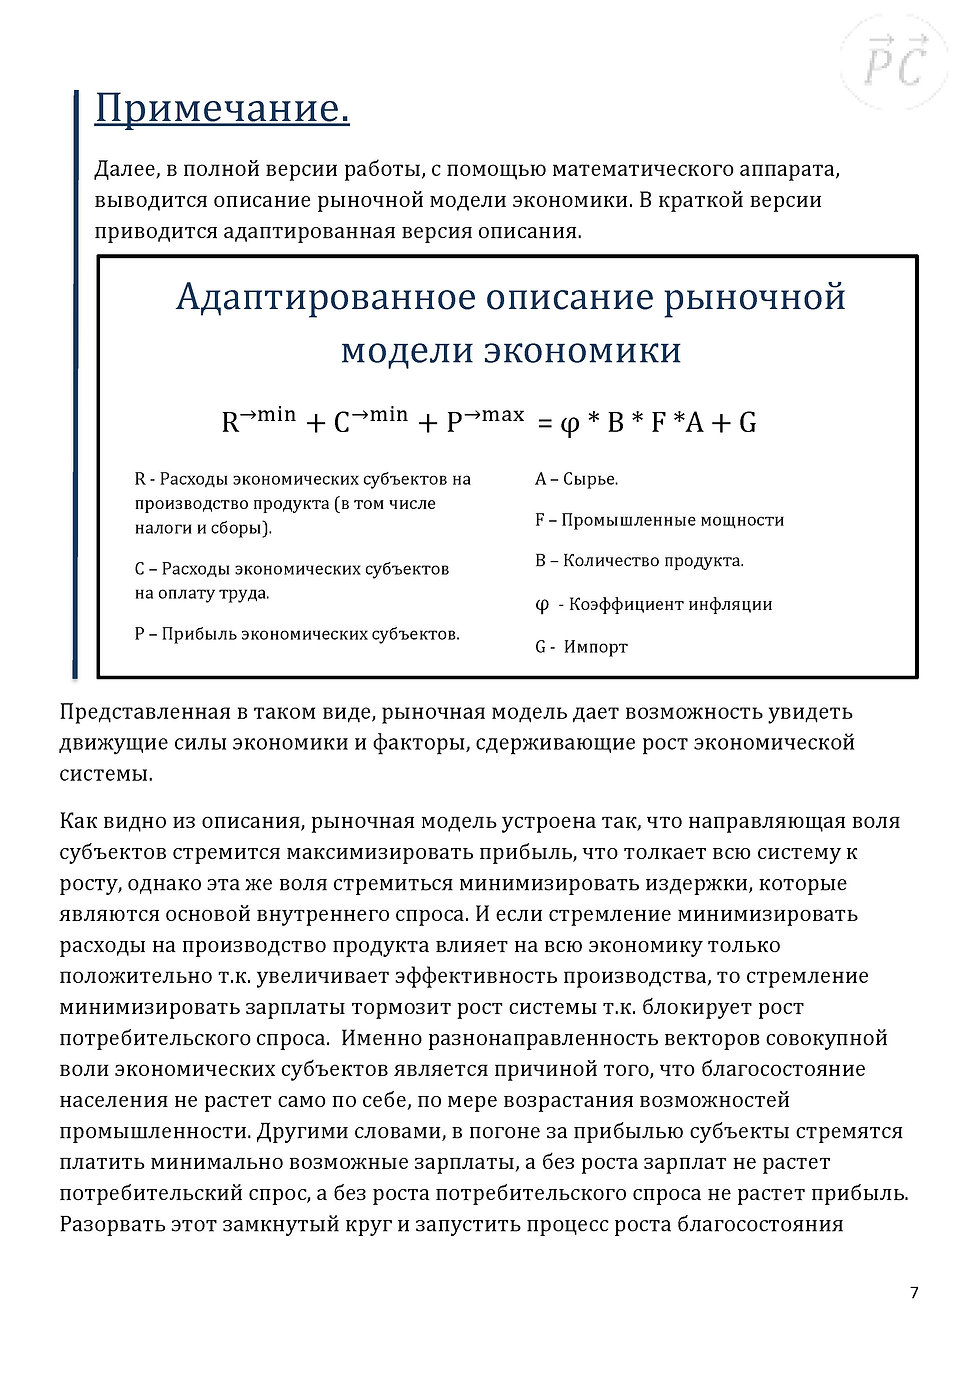 Page_00007.jpg